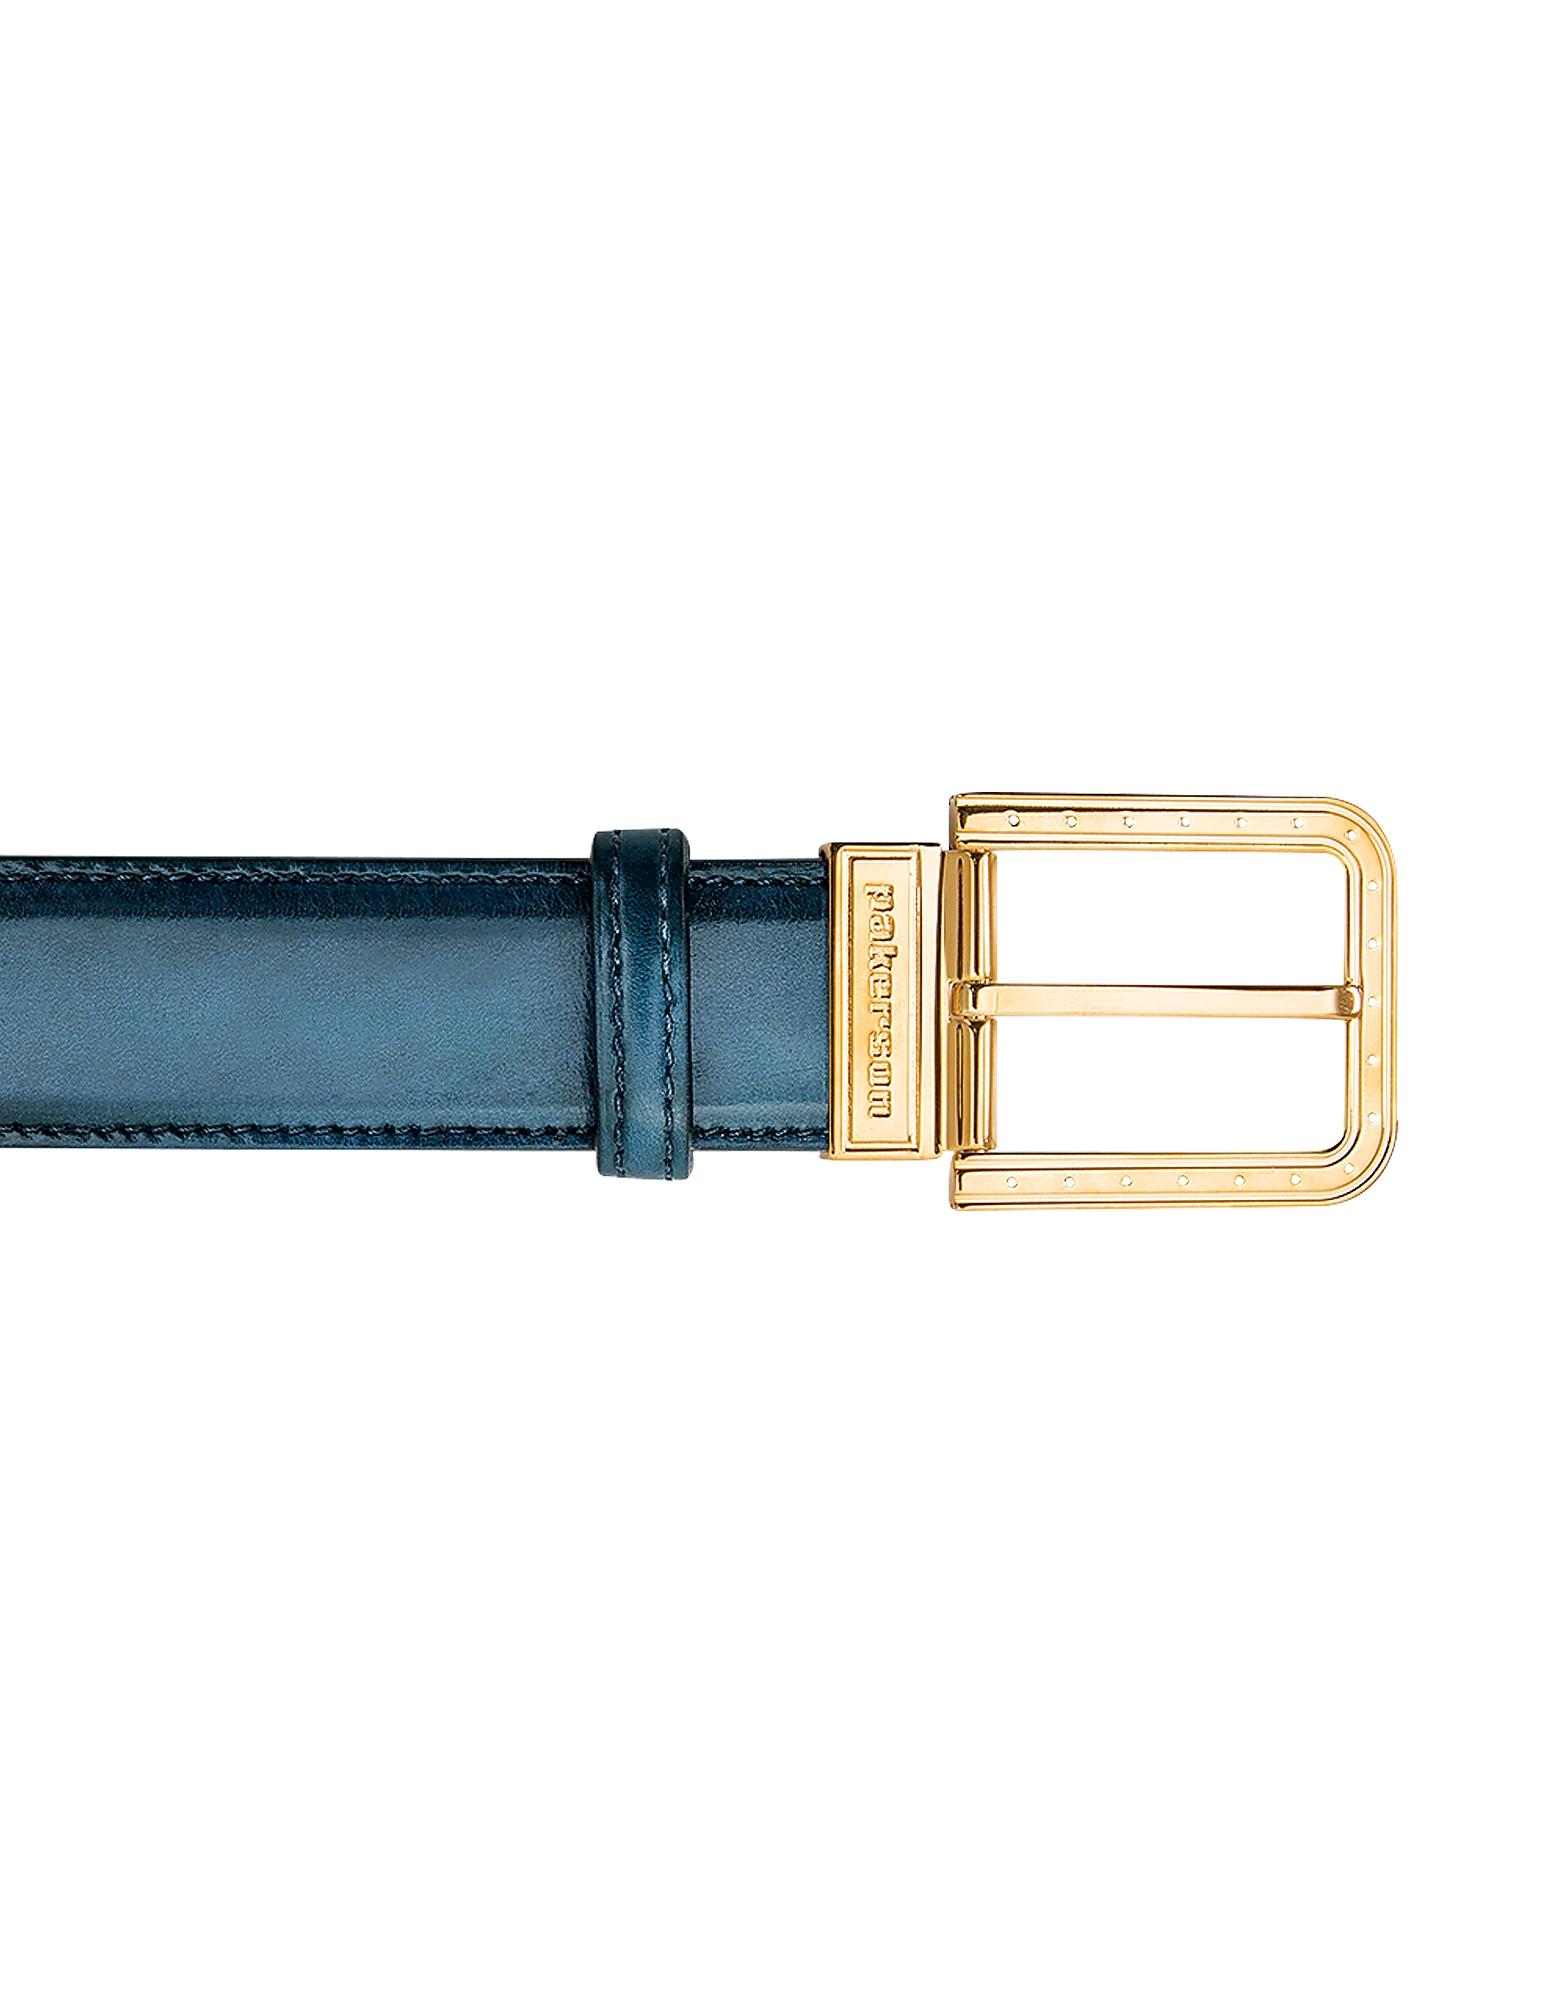 Ripa Blue Island Italian Leather Belt w/ Gold Buckle, Blue / green